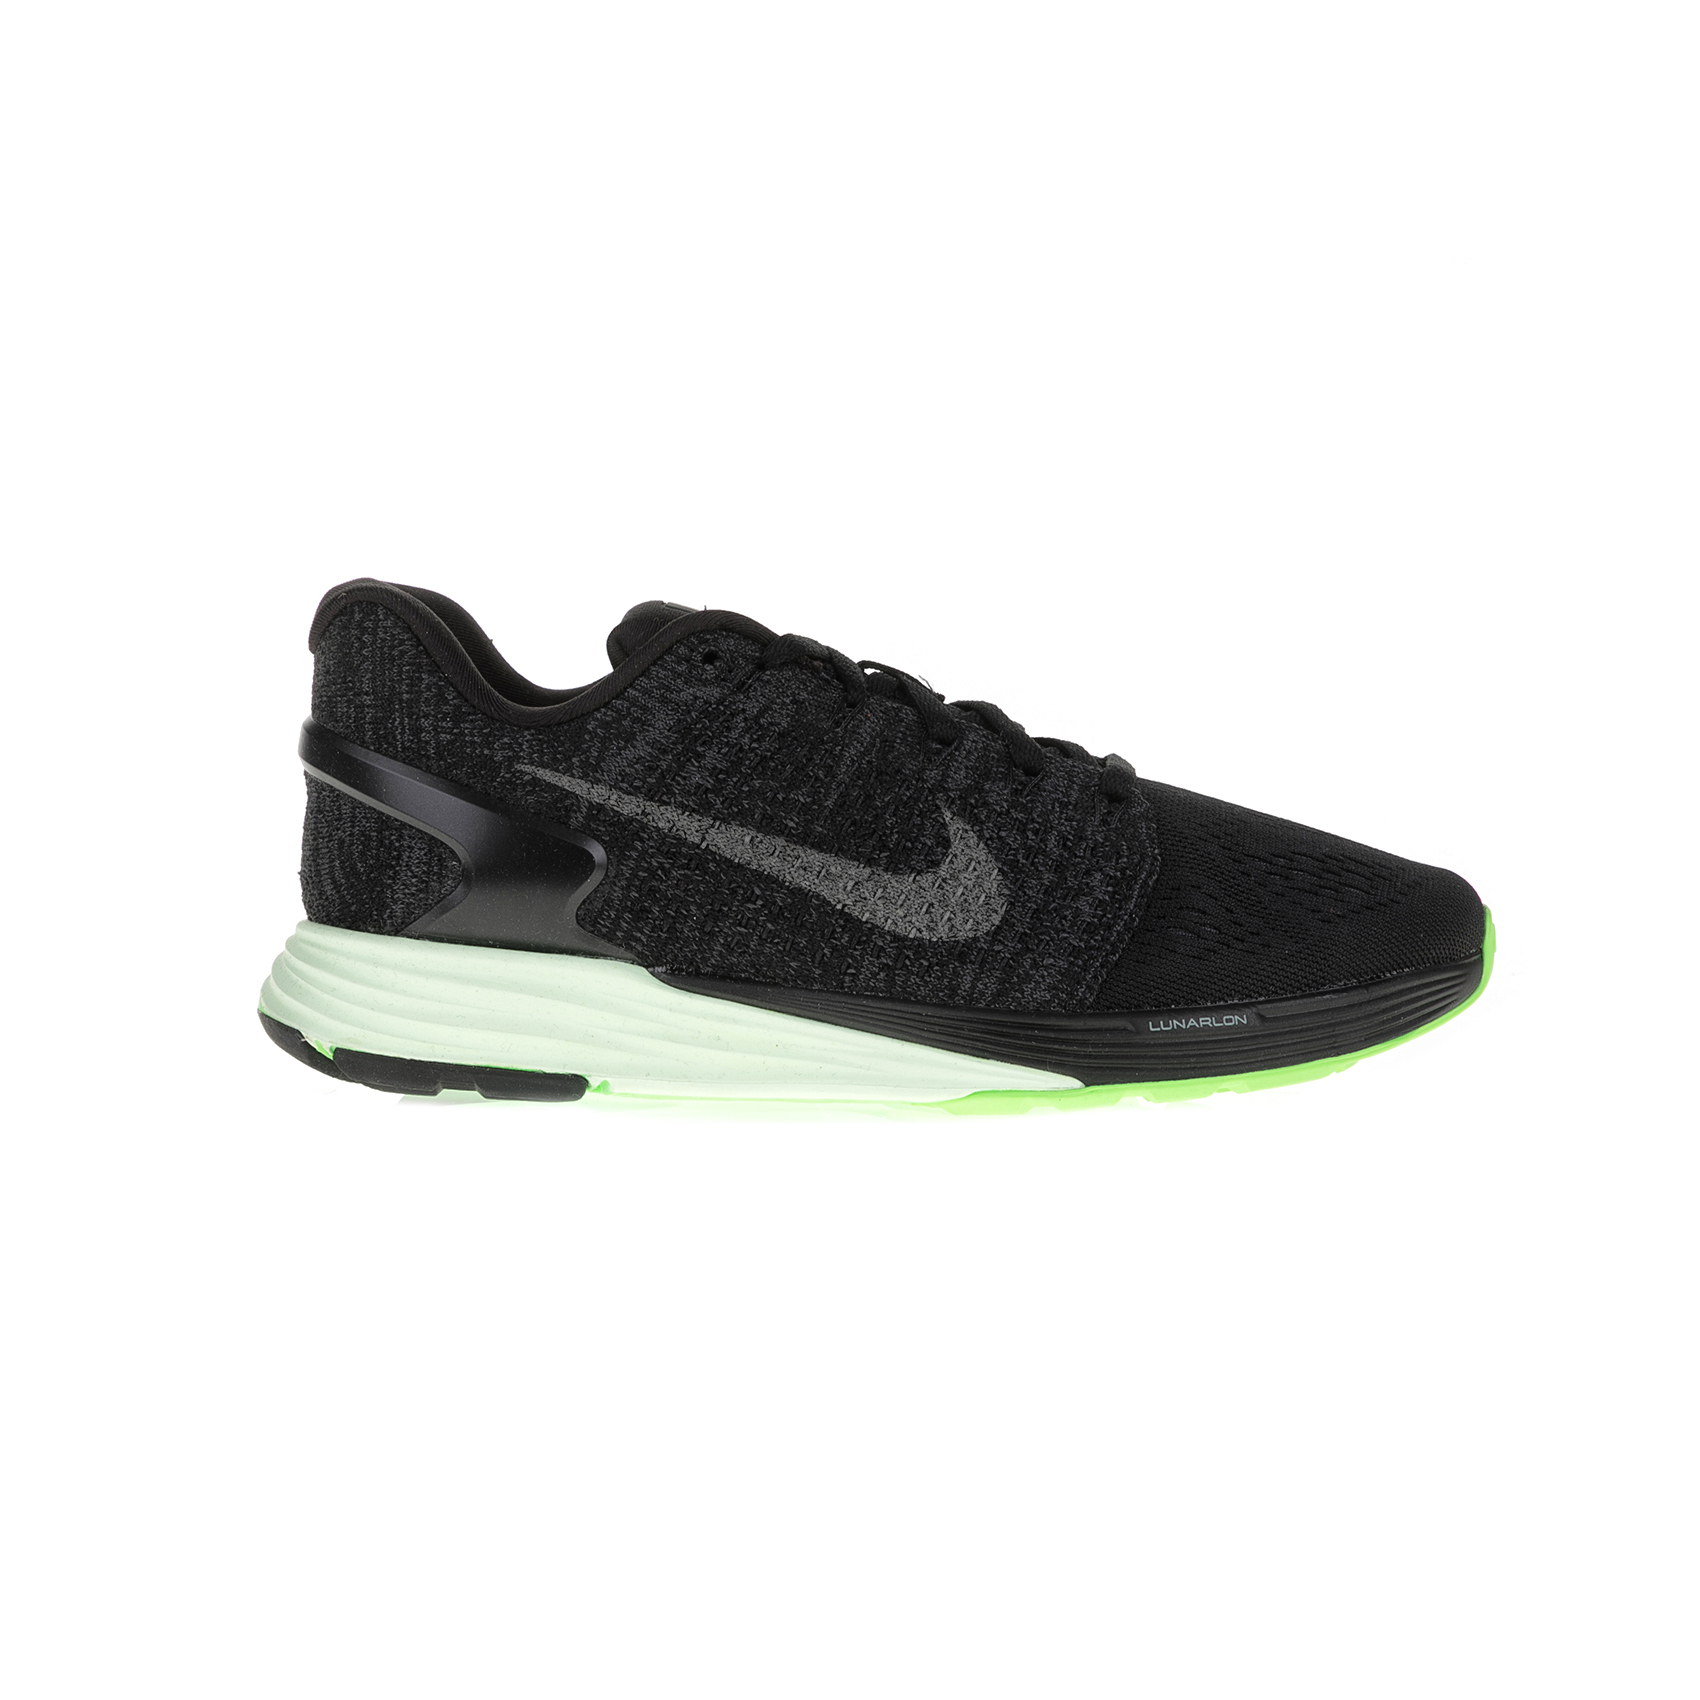 NIKE – Γυναικεία αθλητικά παπούτσια Nike LUNARGLIDE 7 LB μαύρα